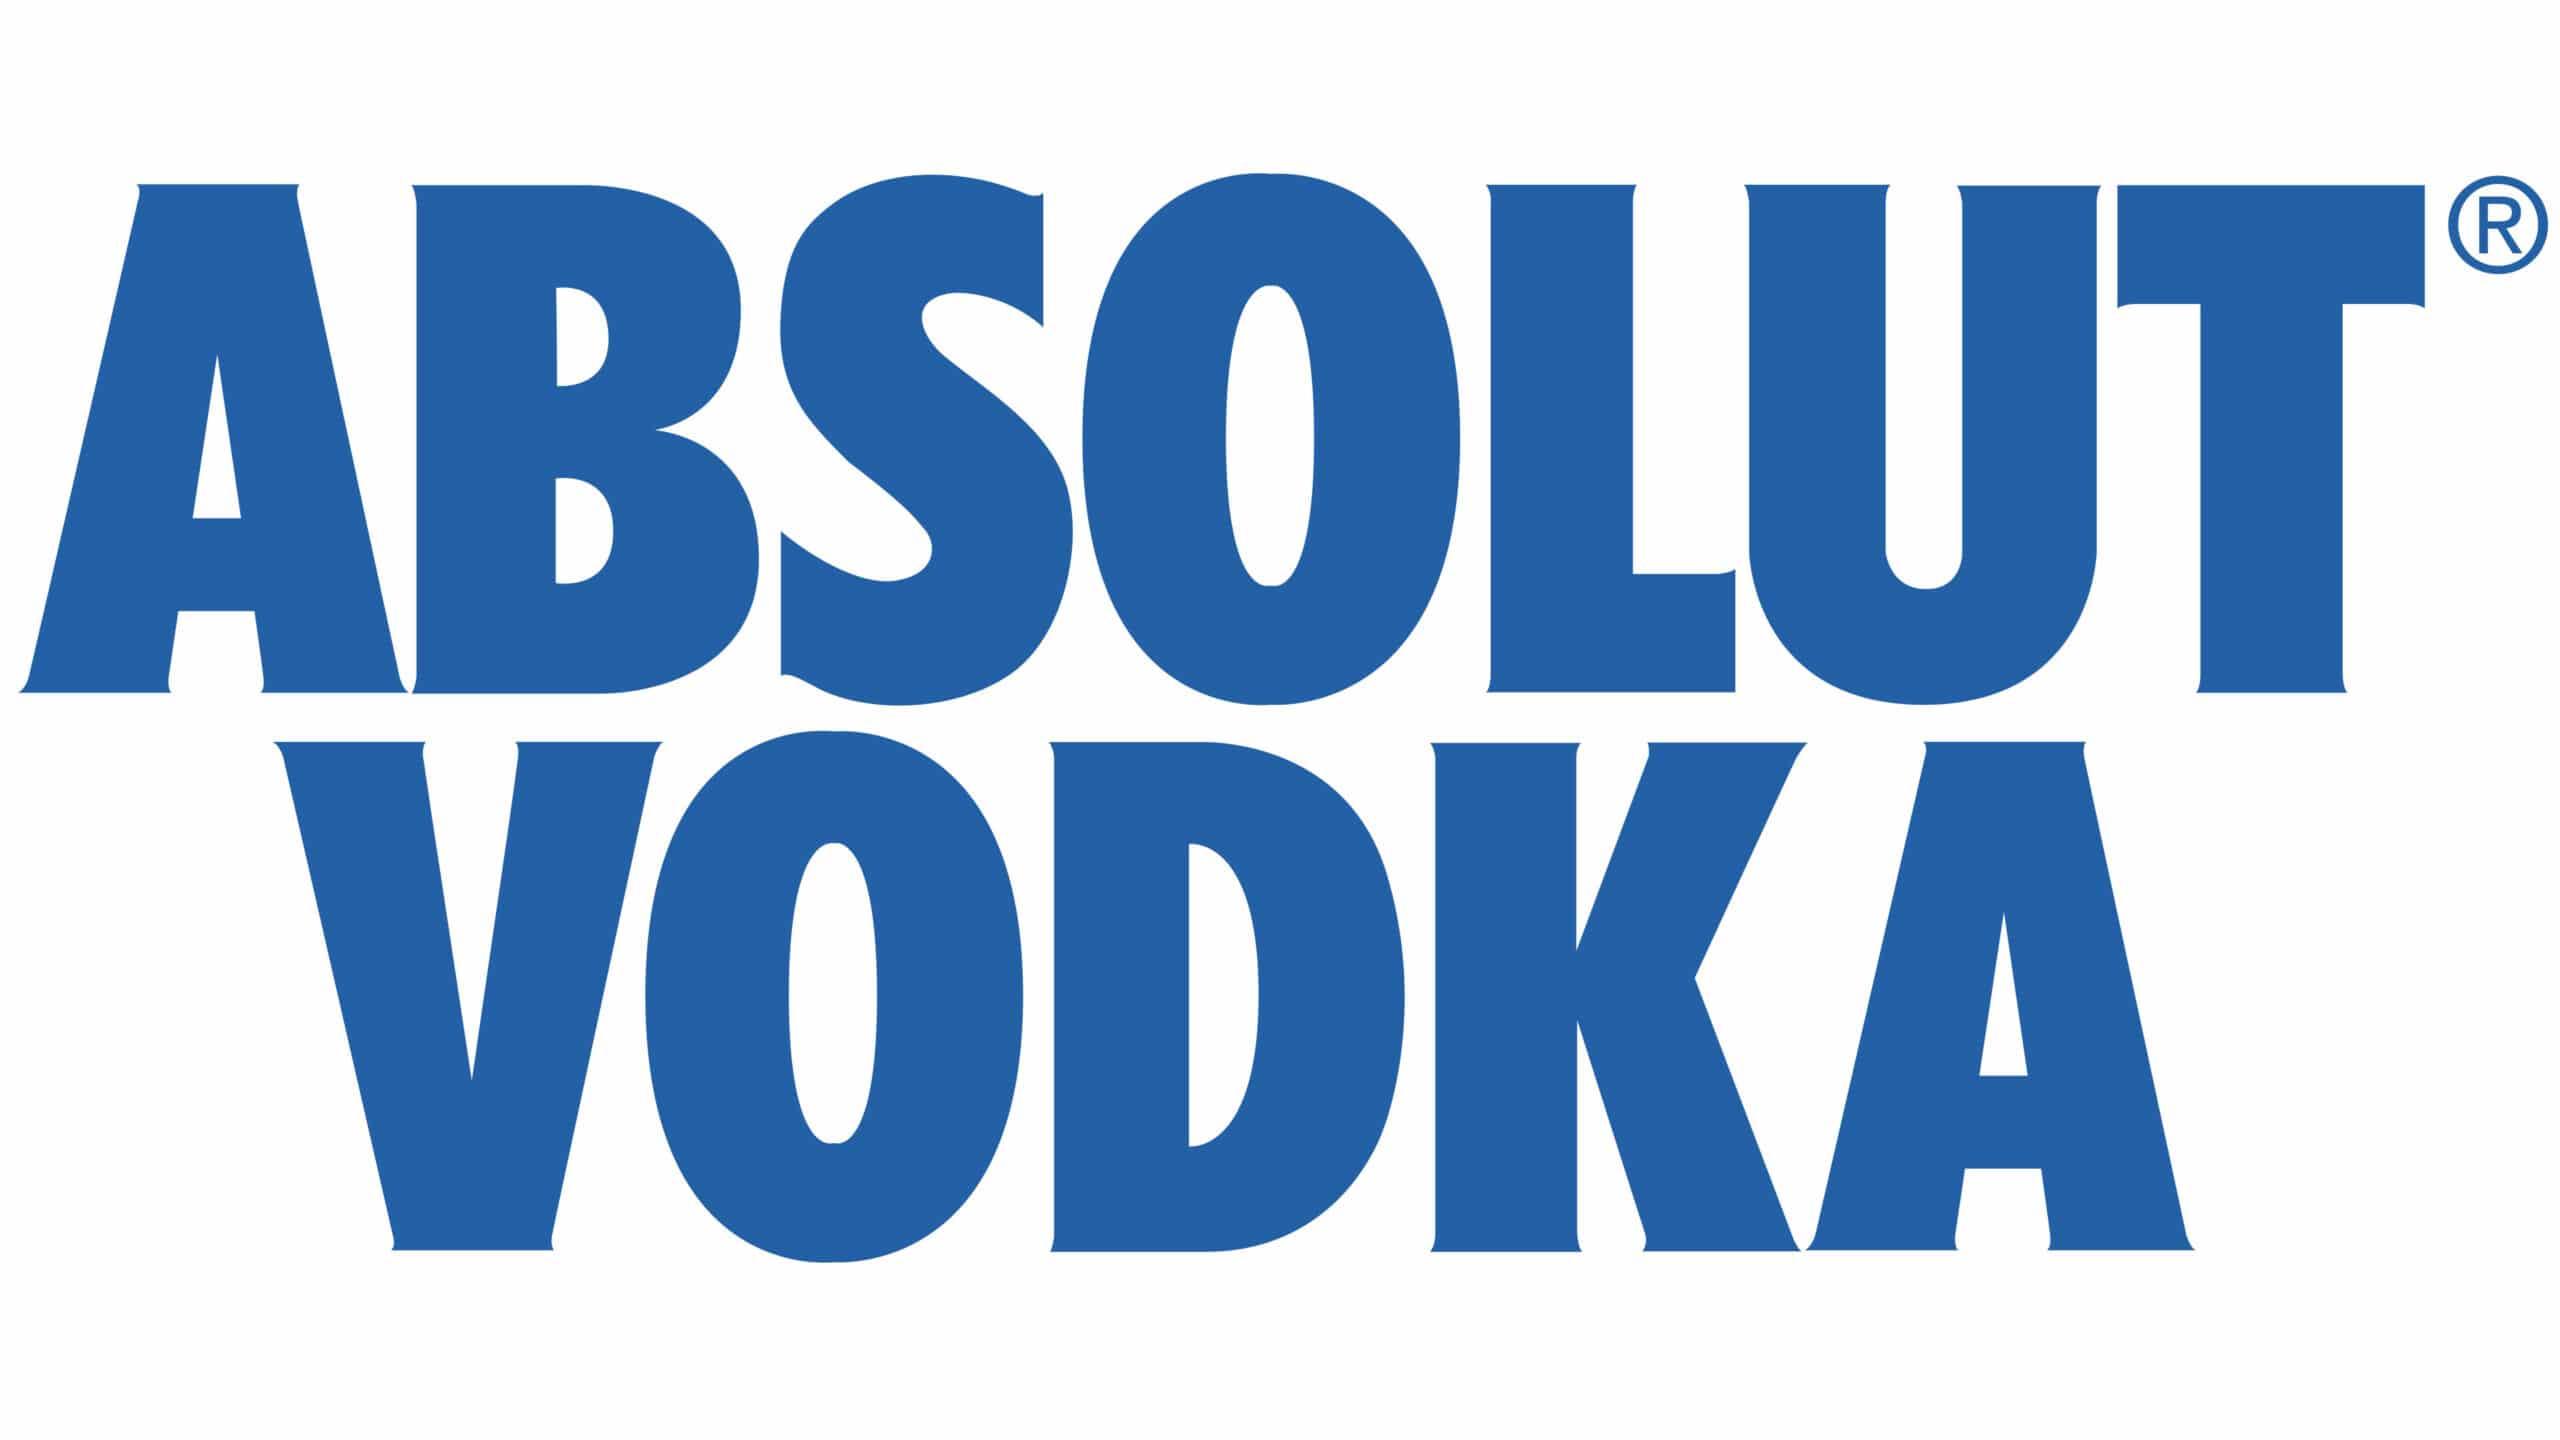 אבסולוט - Absolut